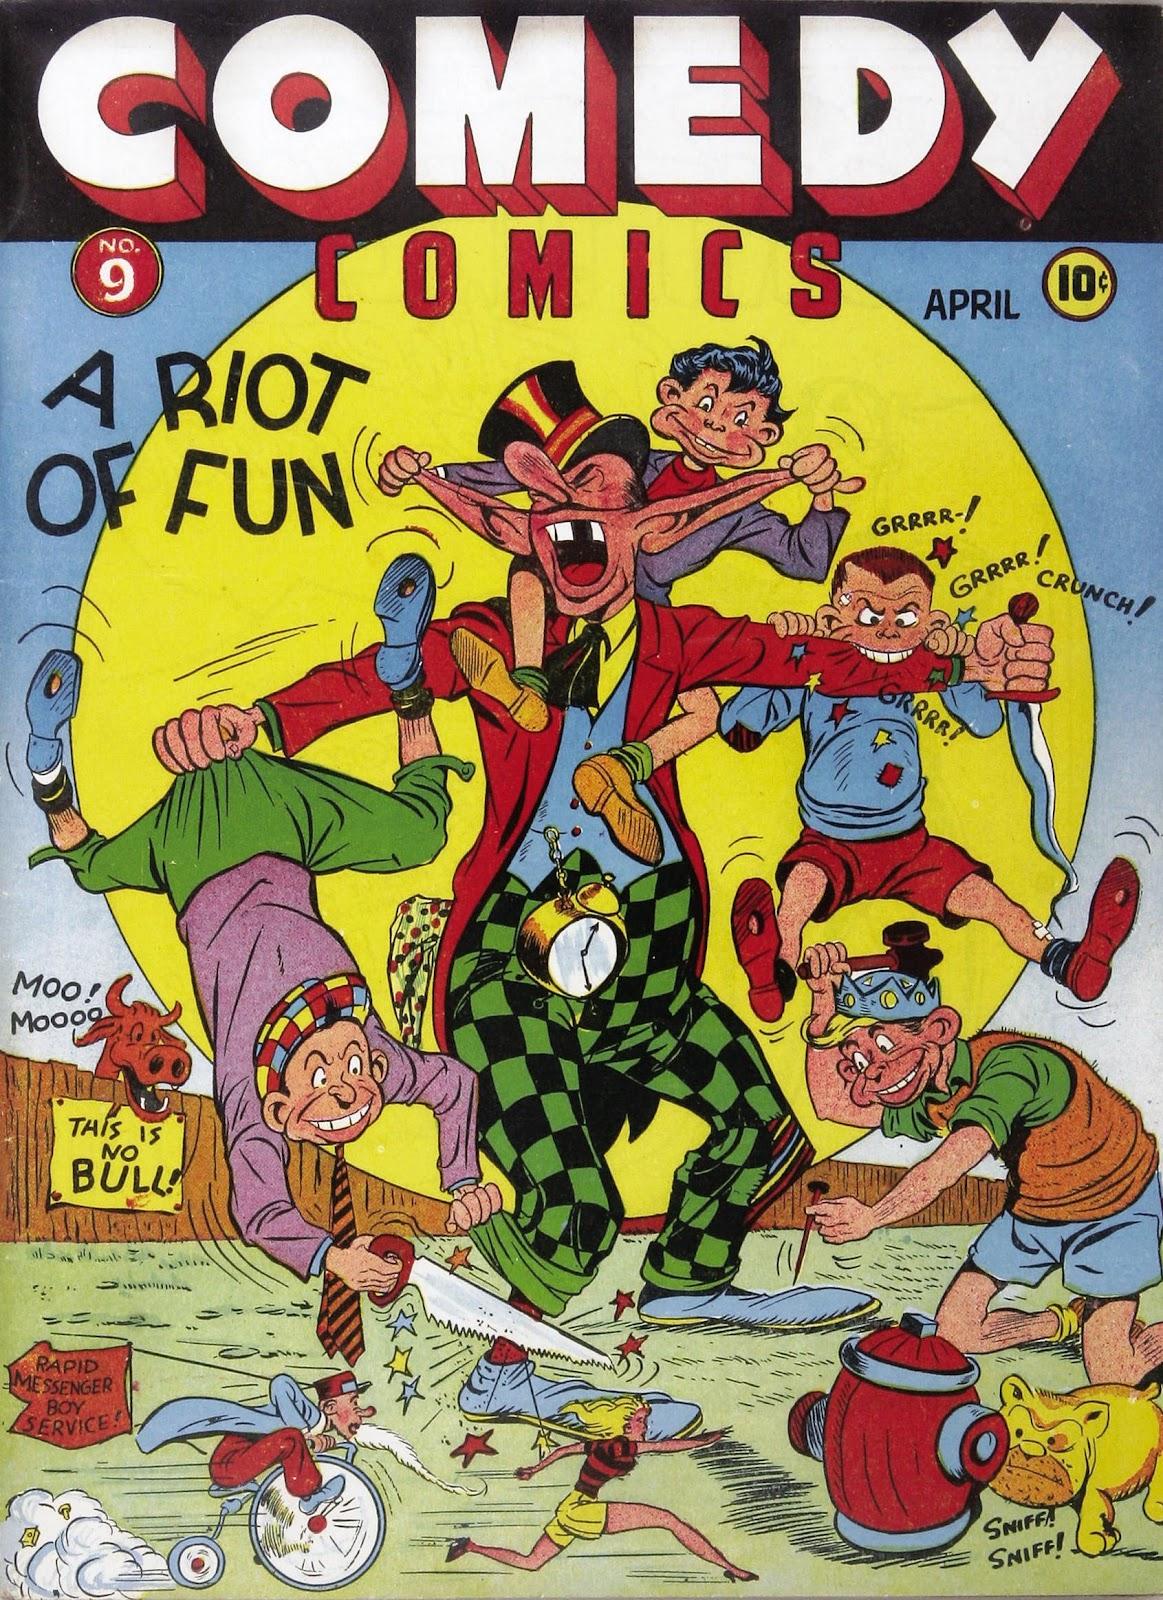 Read online Comedy Comics (1942) comic -  Issue #9 - 1